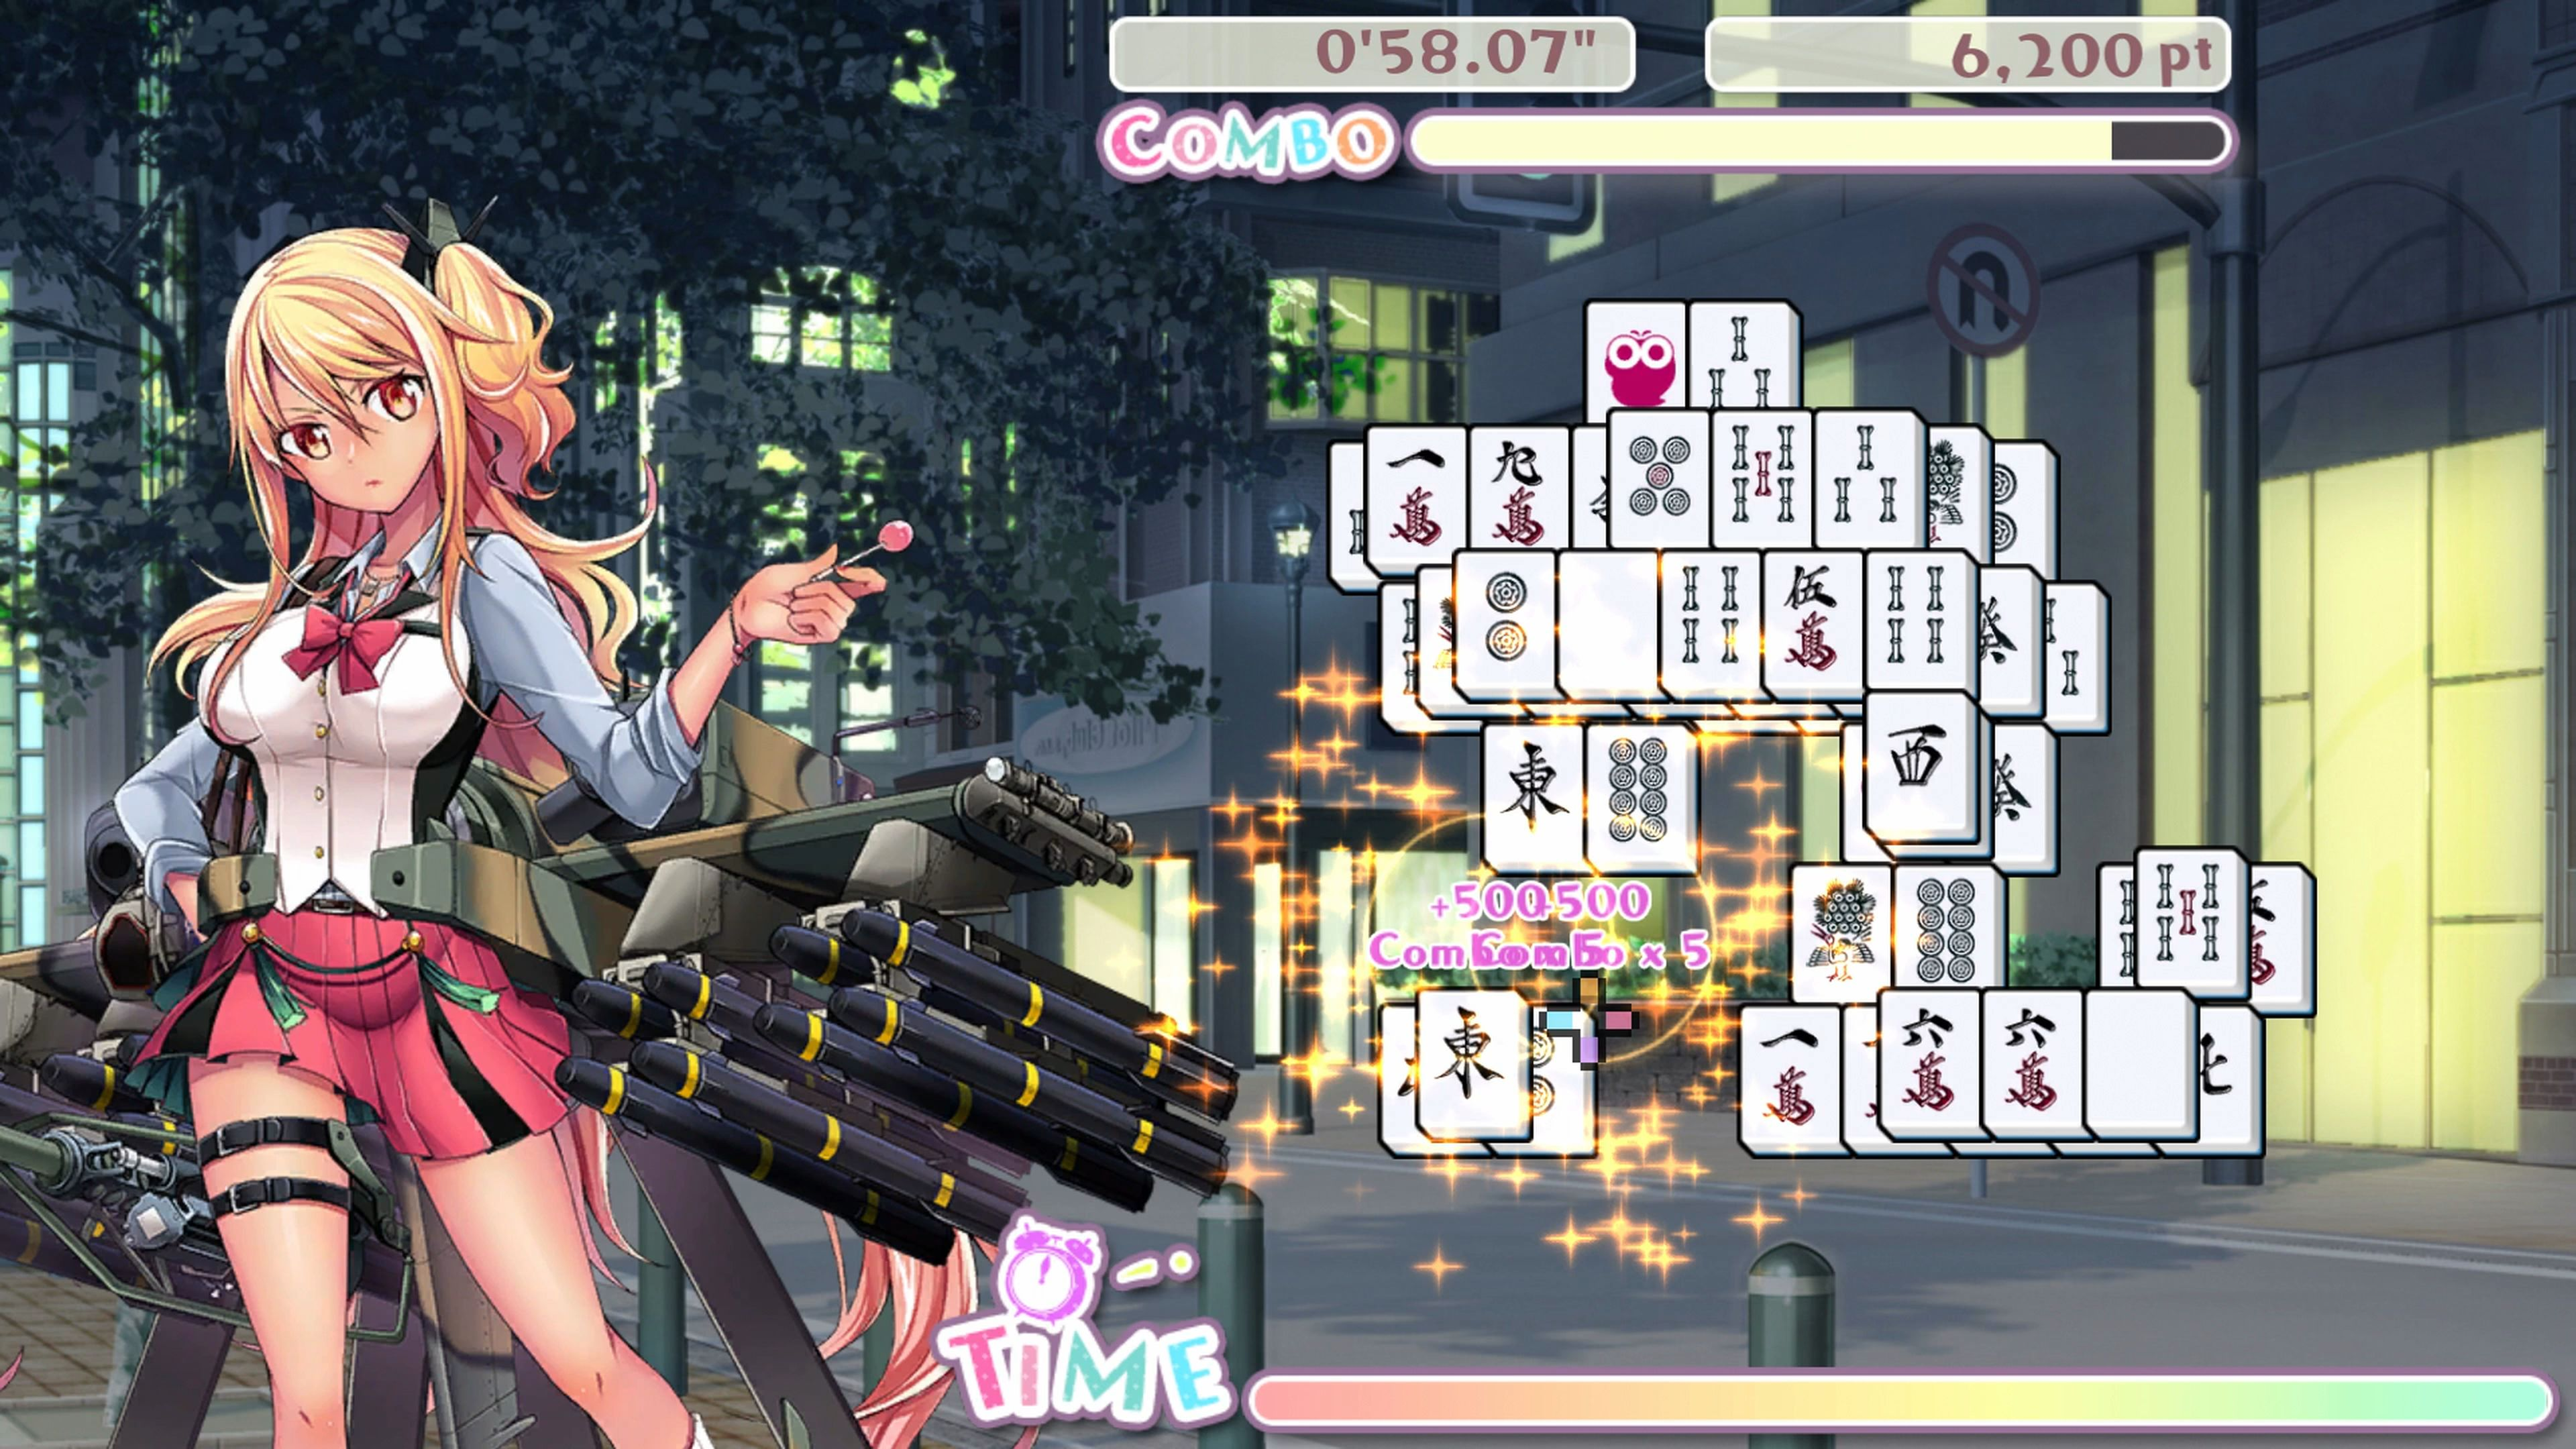 Скриншот №10 к Bishoujo Battle Mahjong Solitaire PS4 and PS5